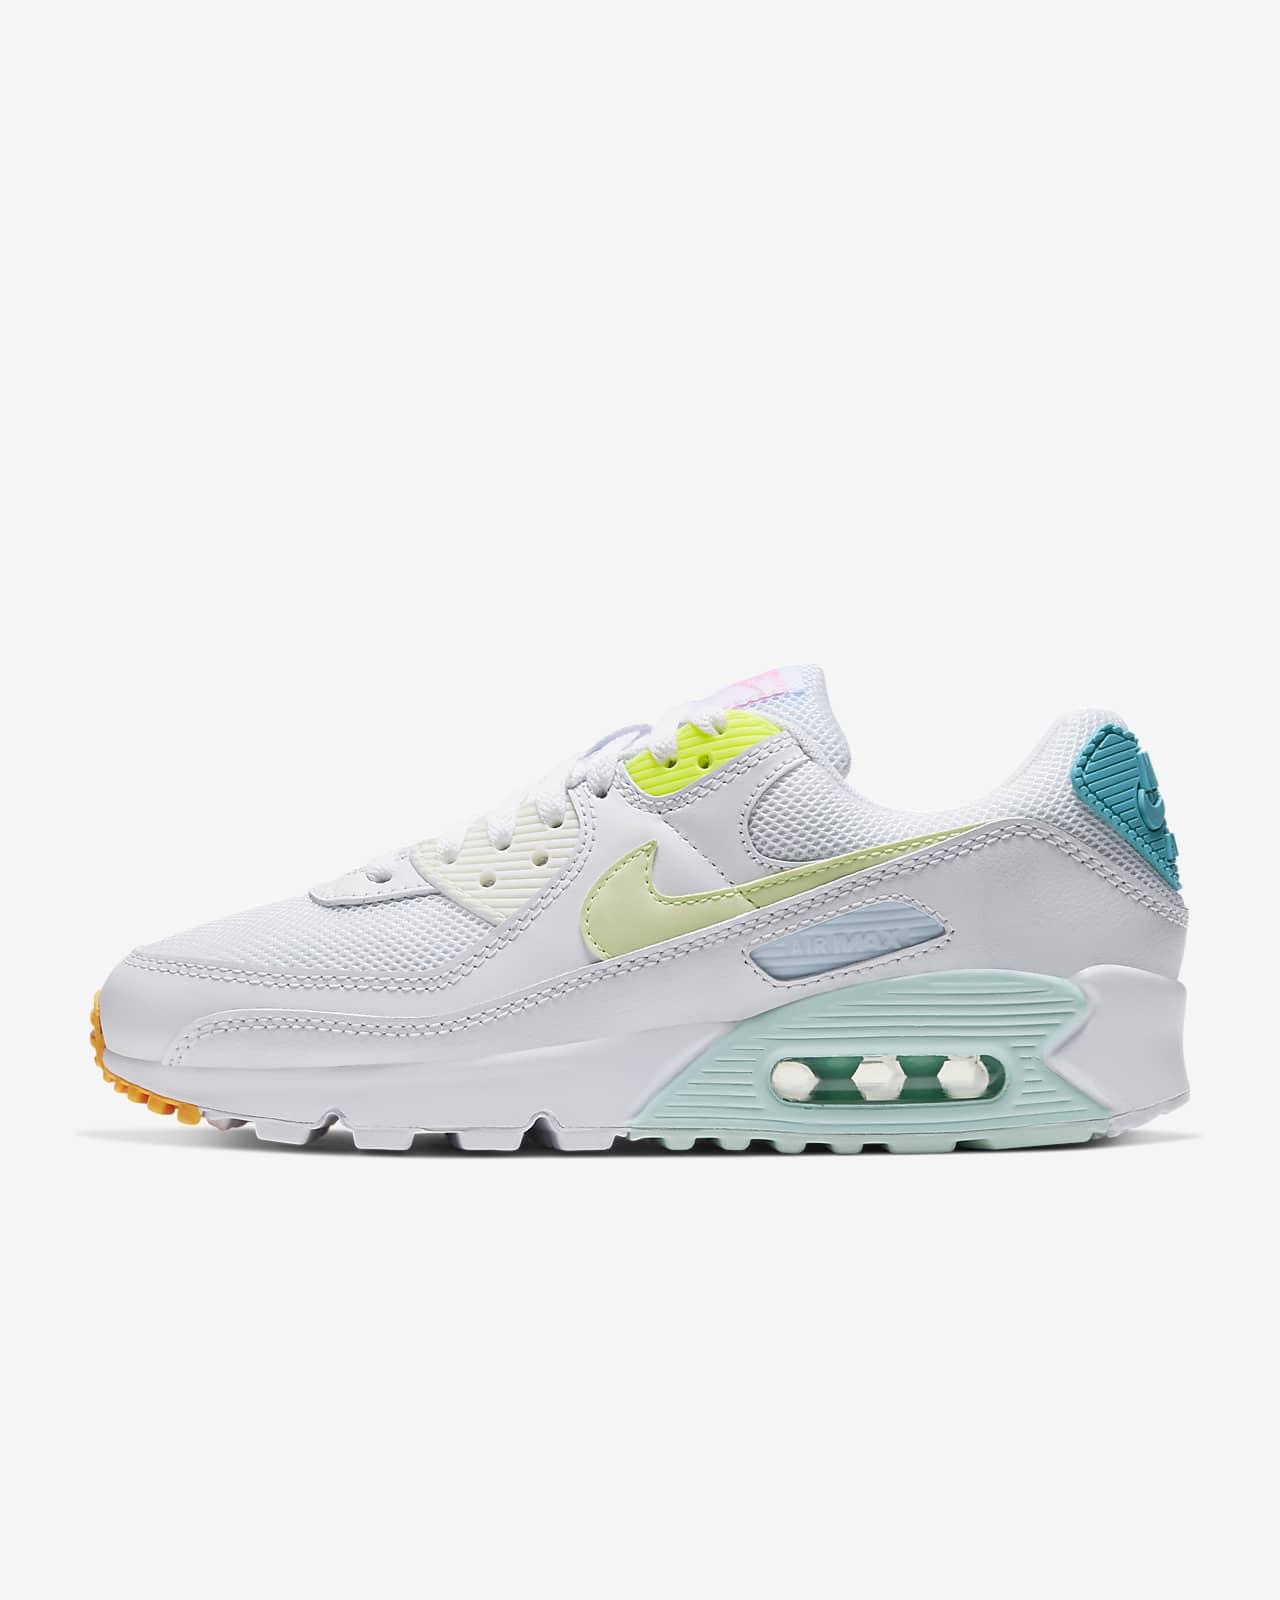 Air Max 90 Women's Shoe